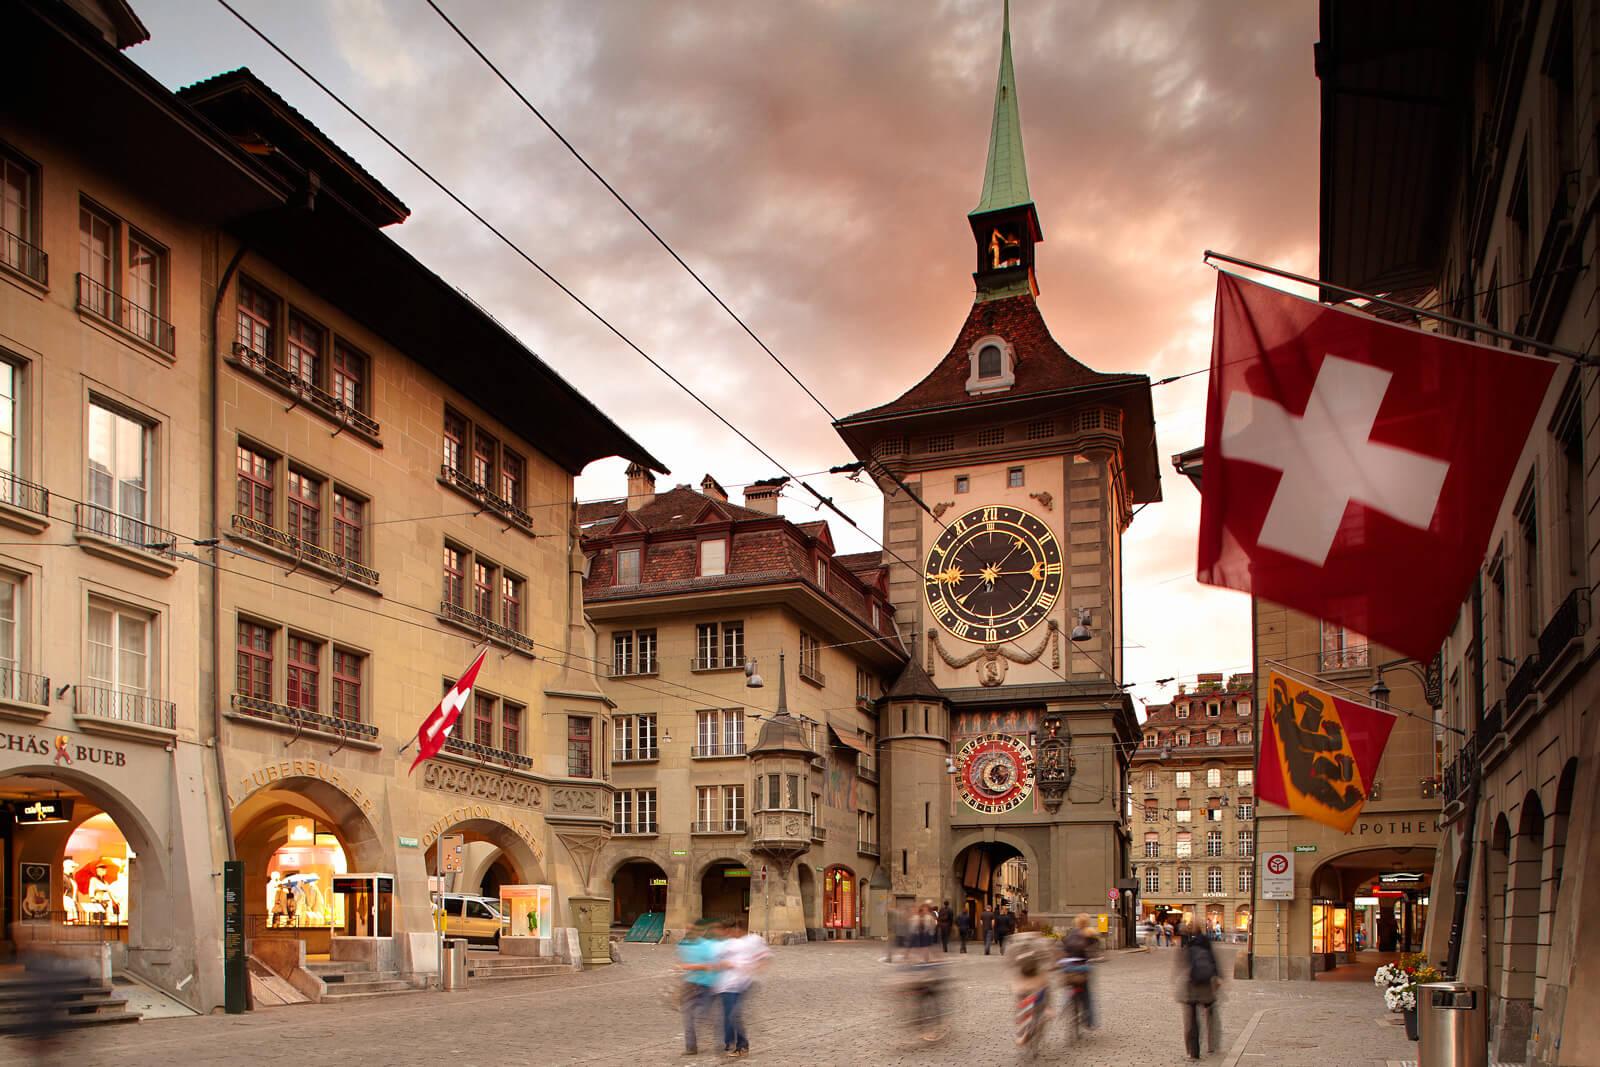 Old City of Bern, Switzerland